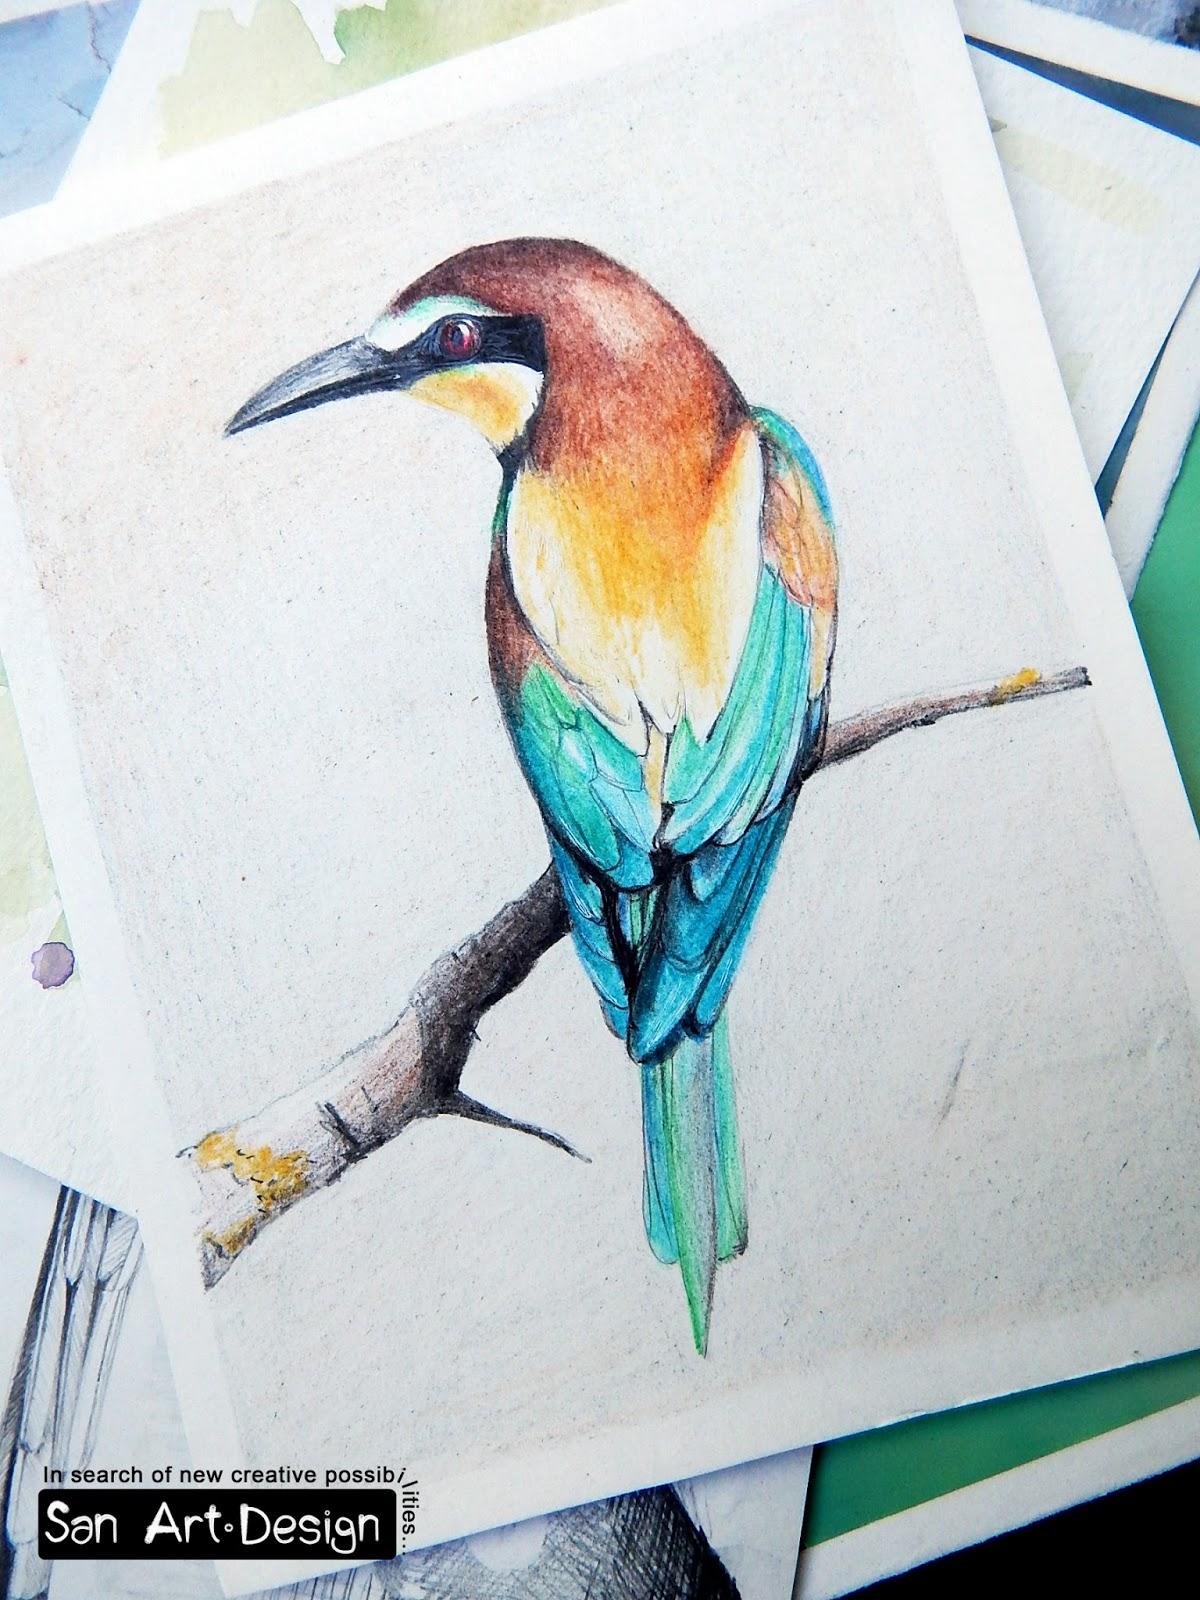 Sandra trubins art blog bird practice colored pencils drawing